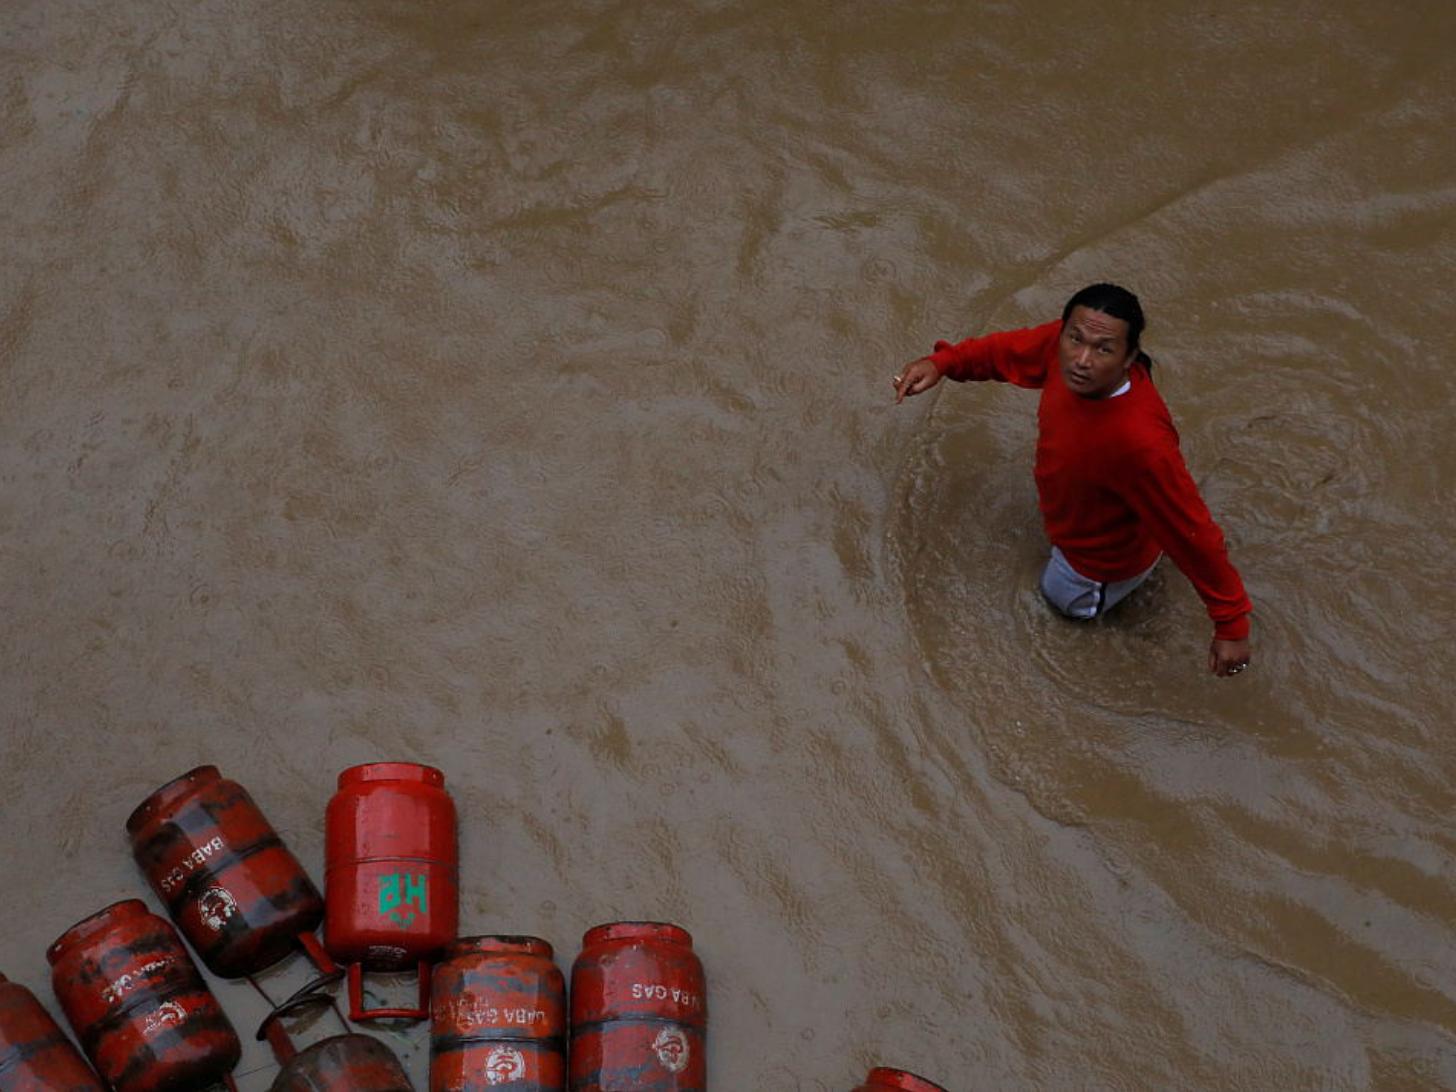 At least 32 dead as heavy rainfalls hit Nepal